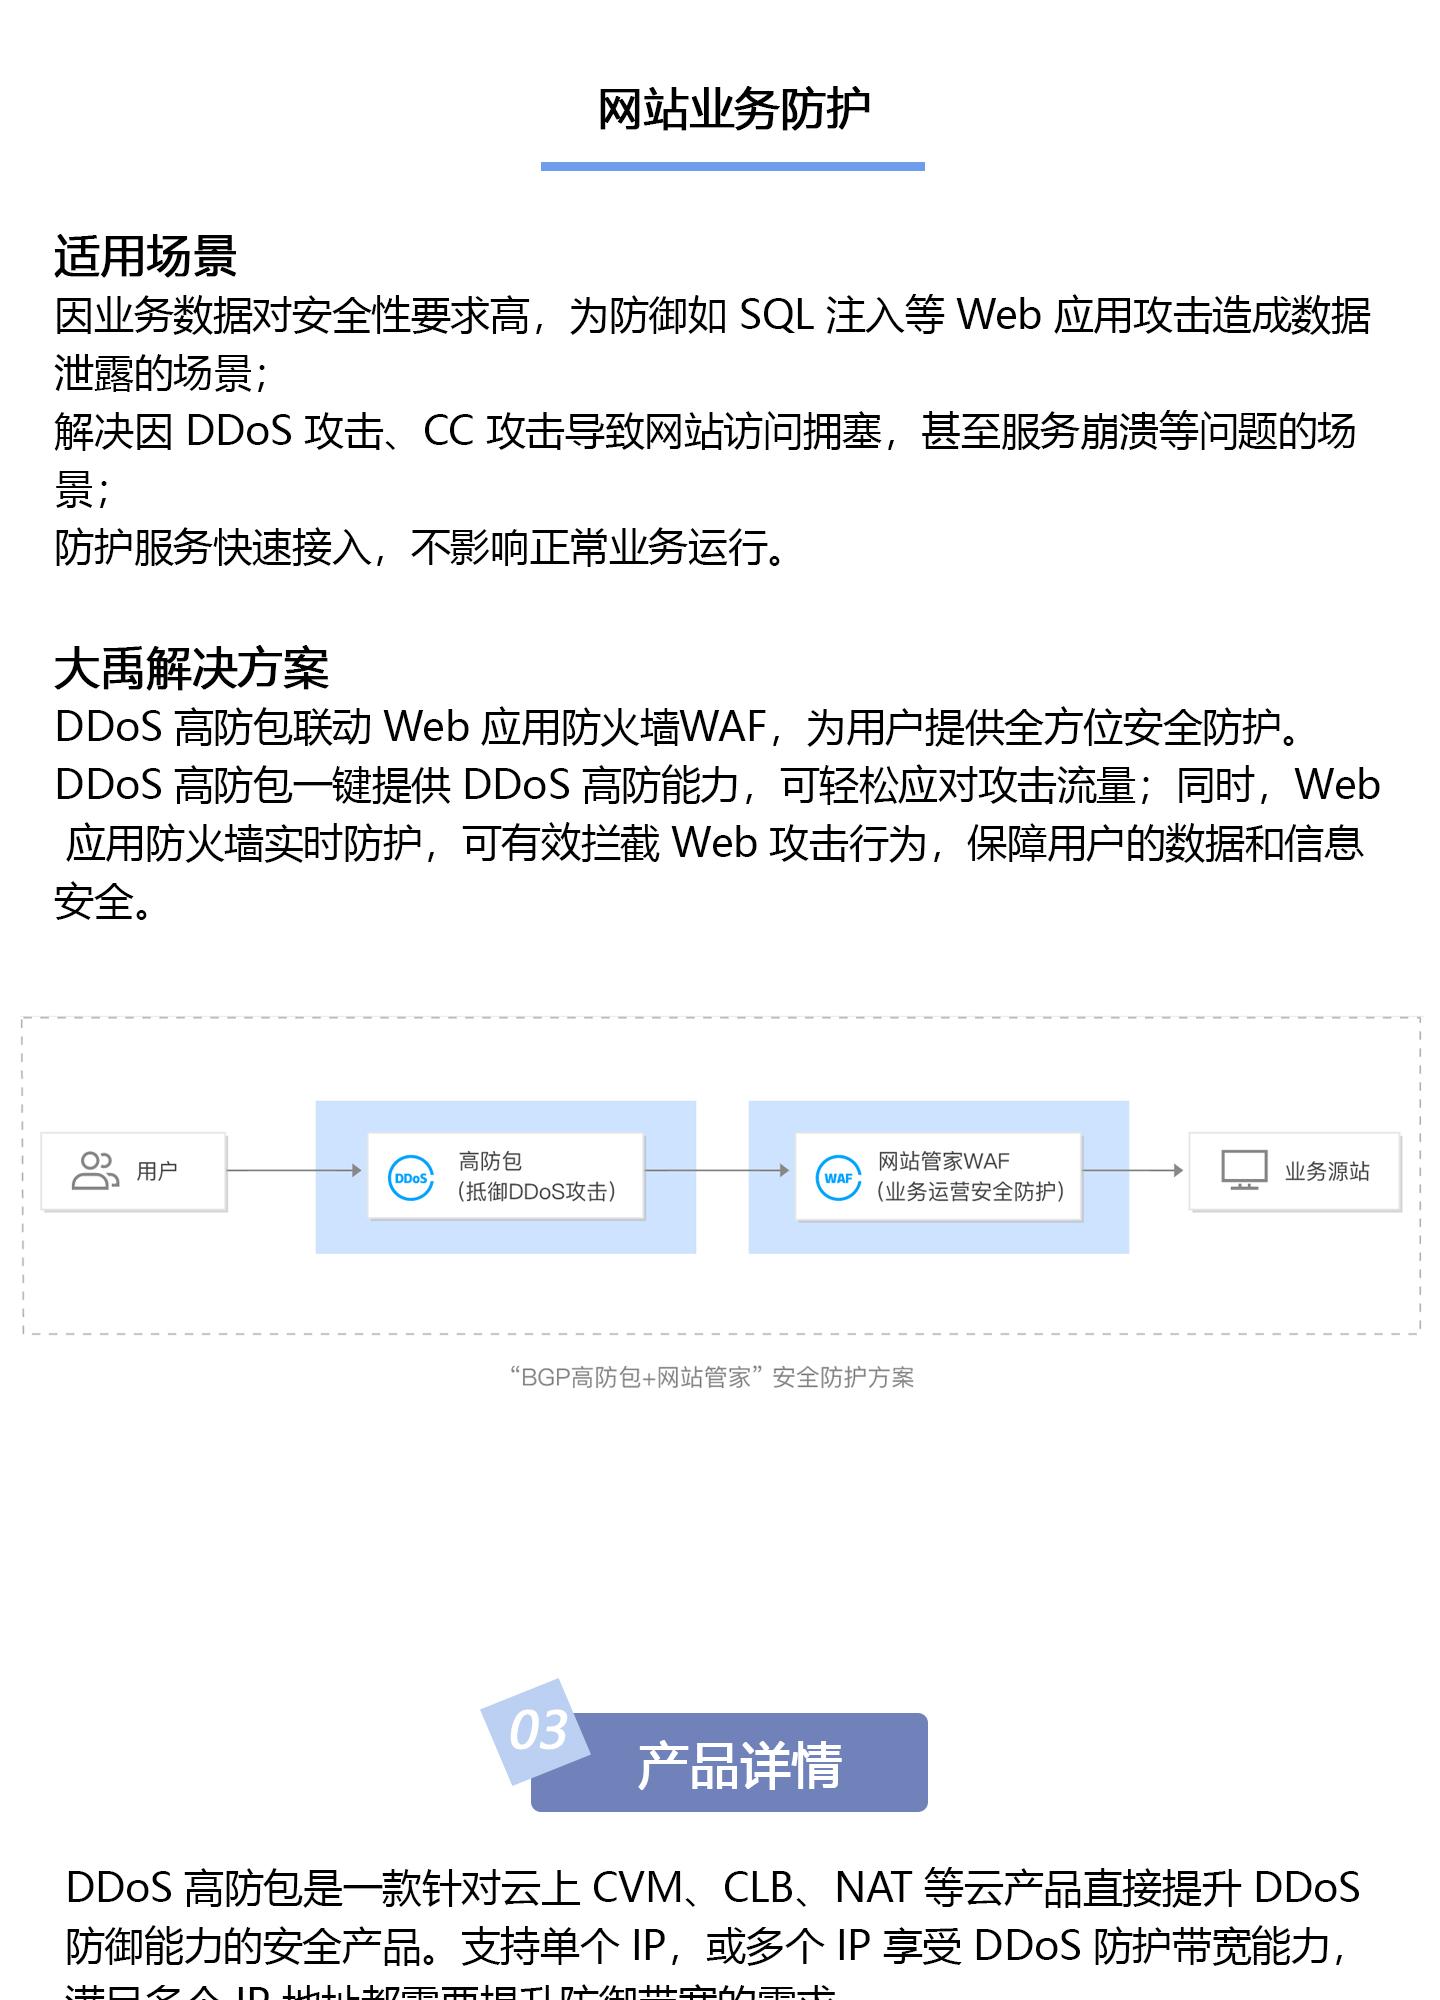 T-Sec-DDoS-高防包1440_05.jpg